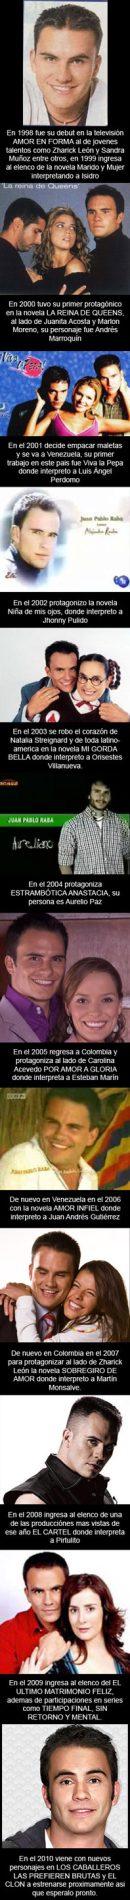 Personajes: Juan Pablo Raba